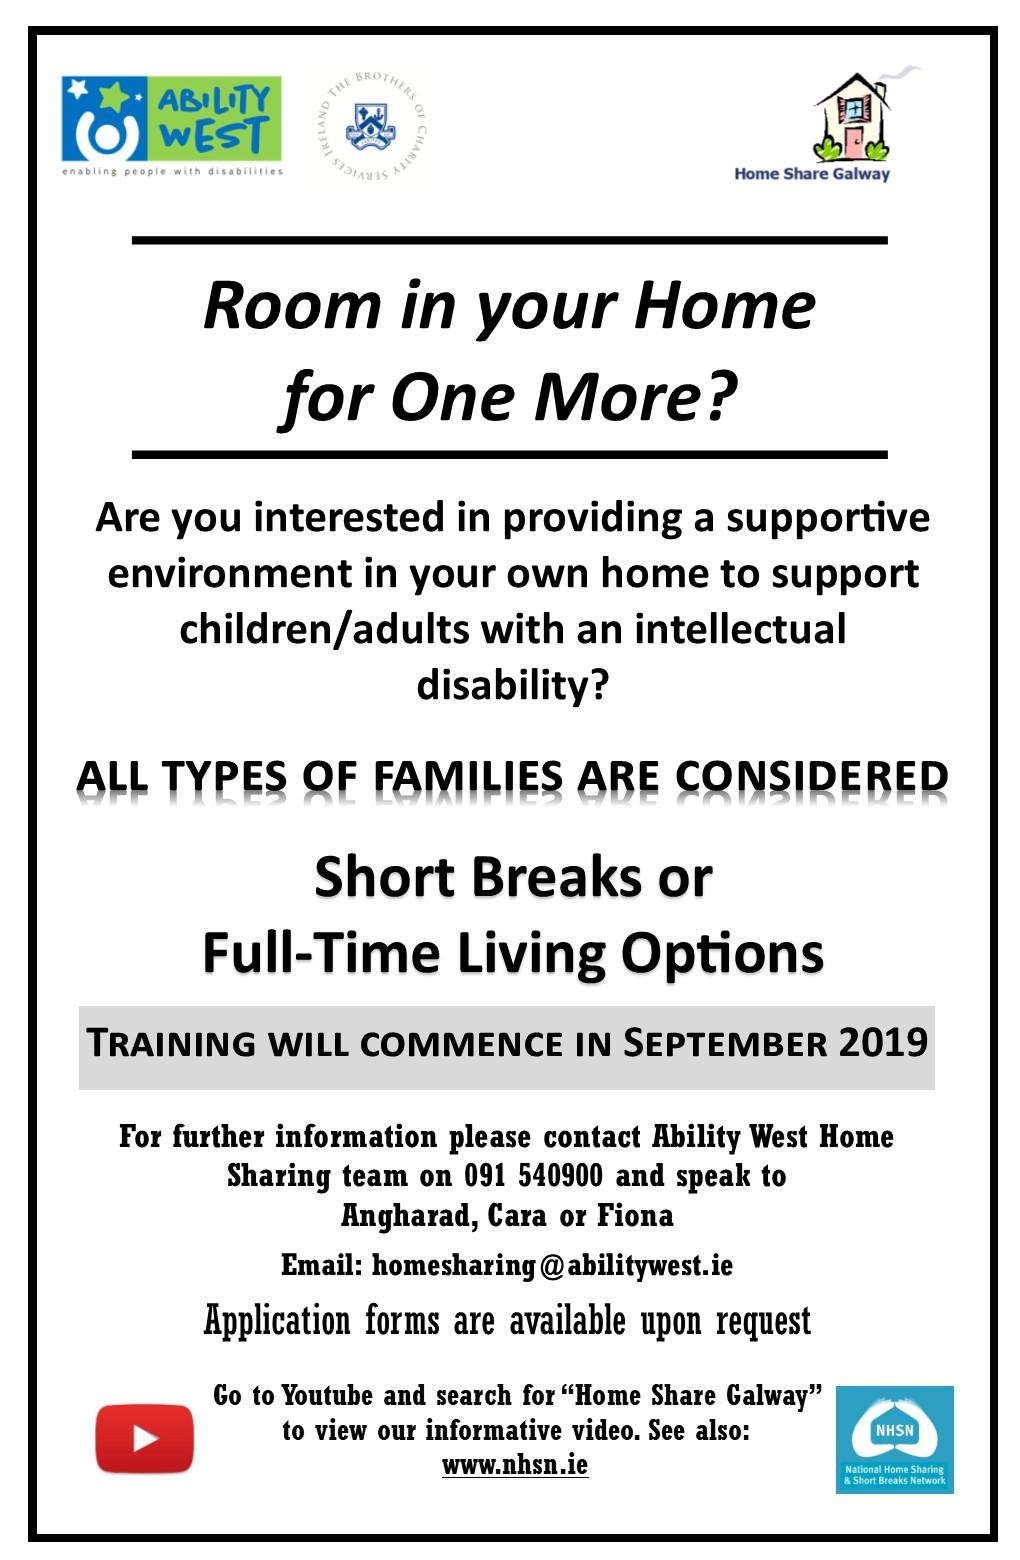 Home Sharing Training Recruitment Poster 2019.jpg